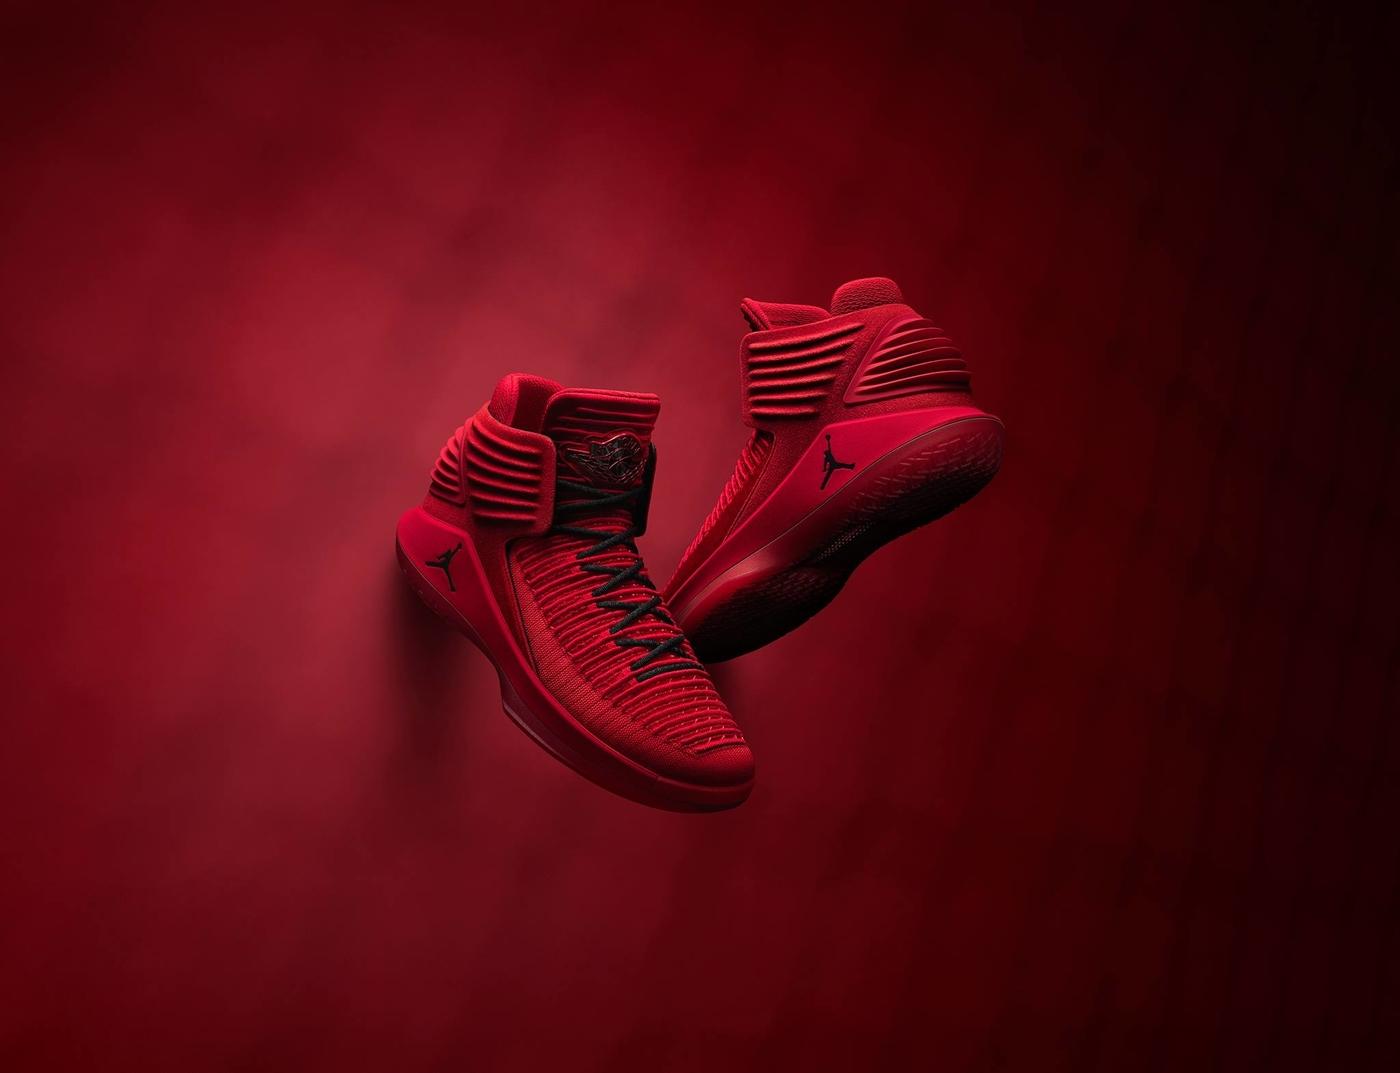 red Air Jordans | where to shop sneakers in Hong Kong